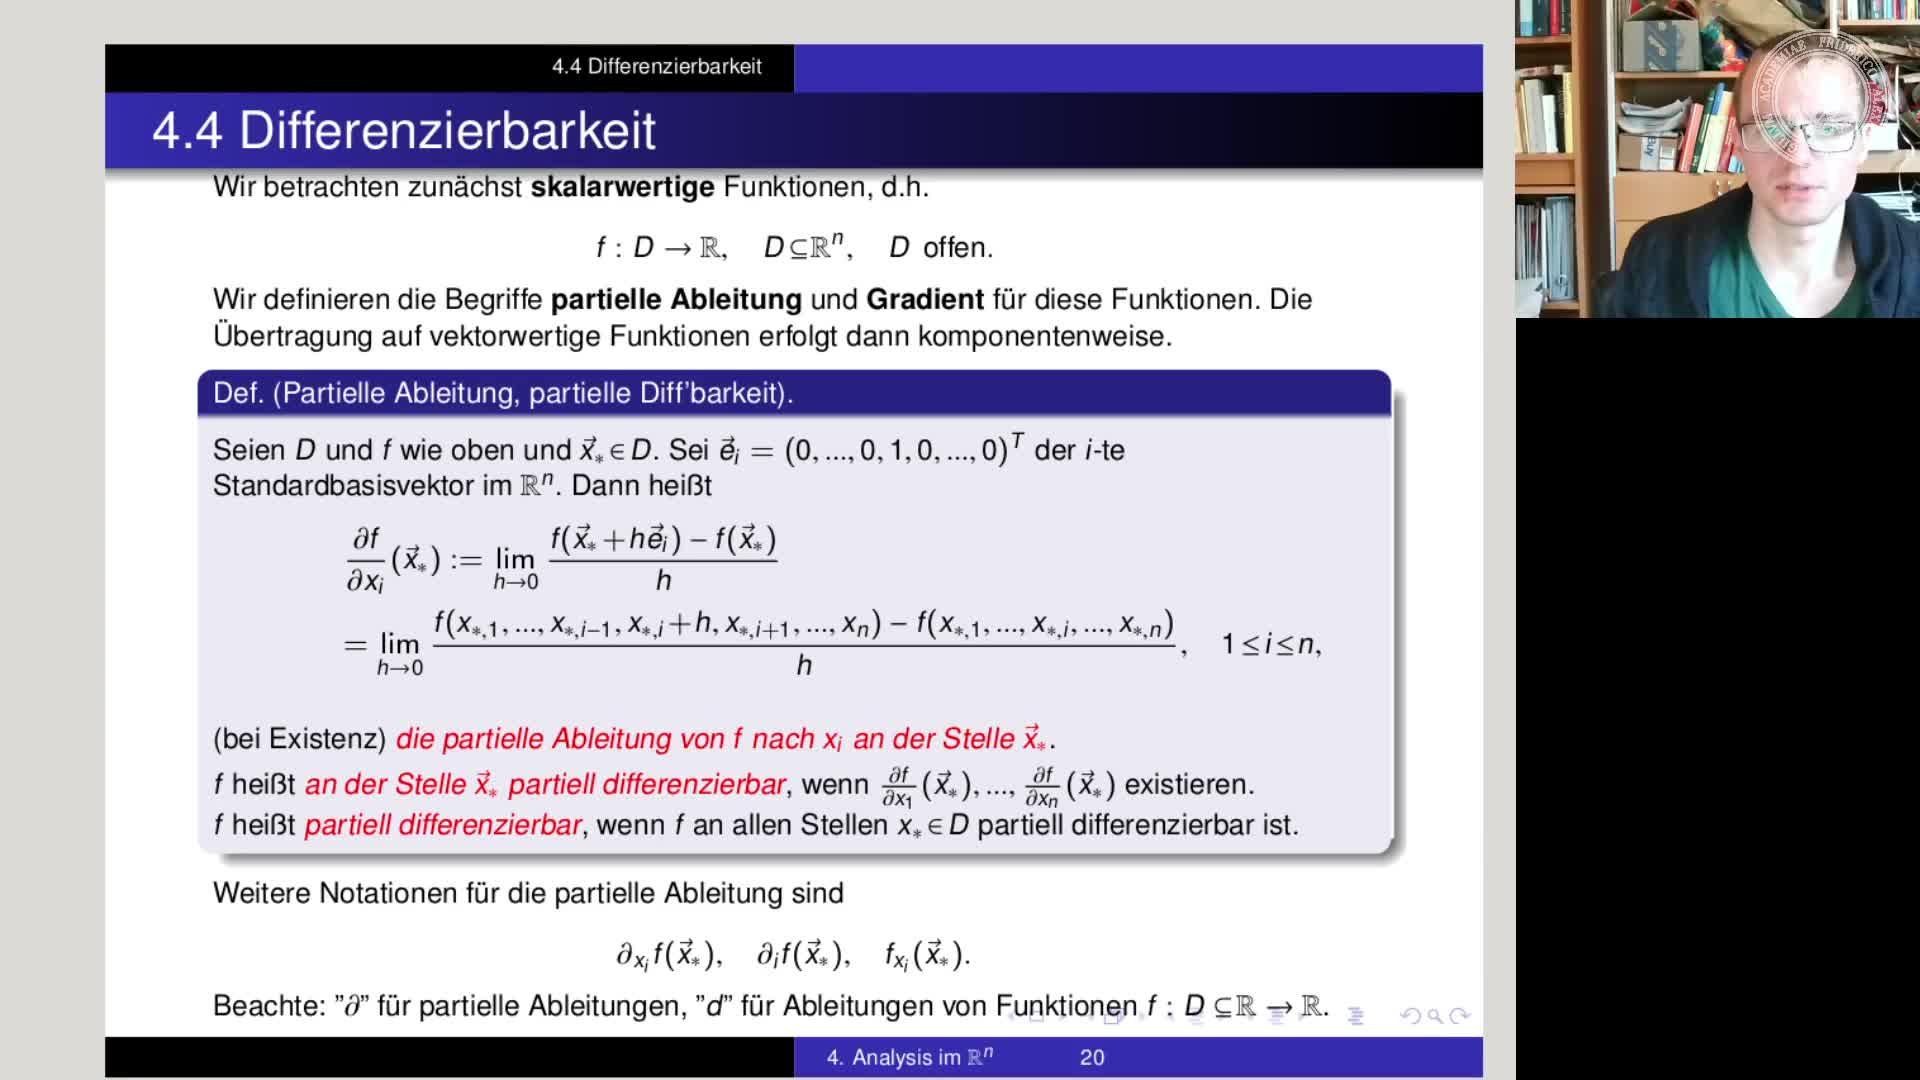 VL_11_4_Partielle_Ableitung_Rn preview image